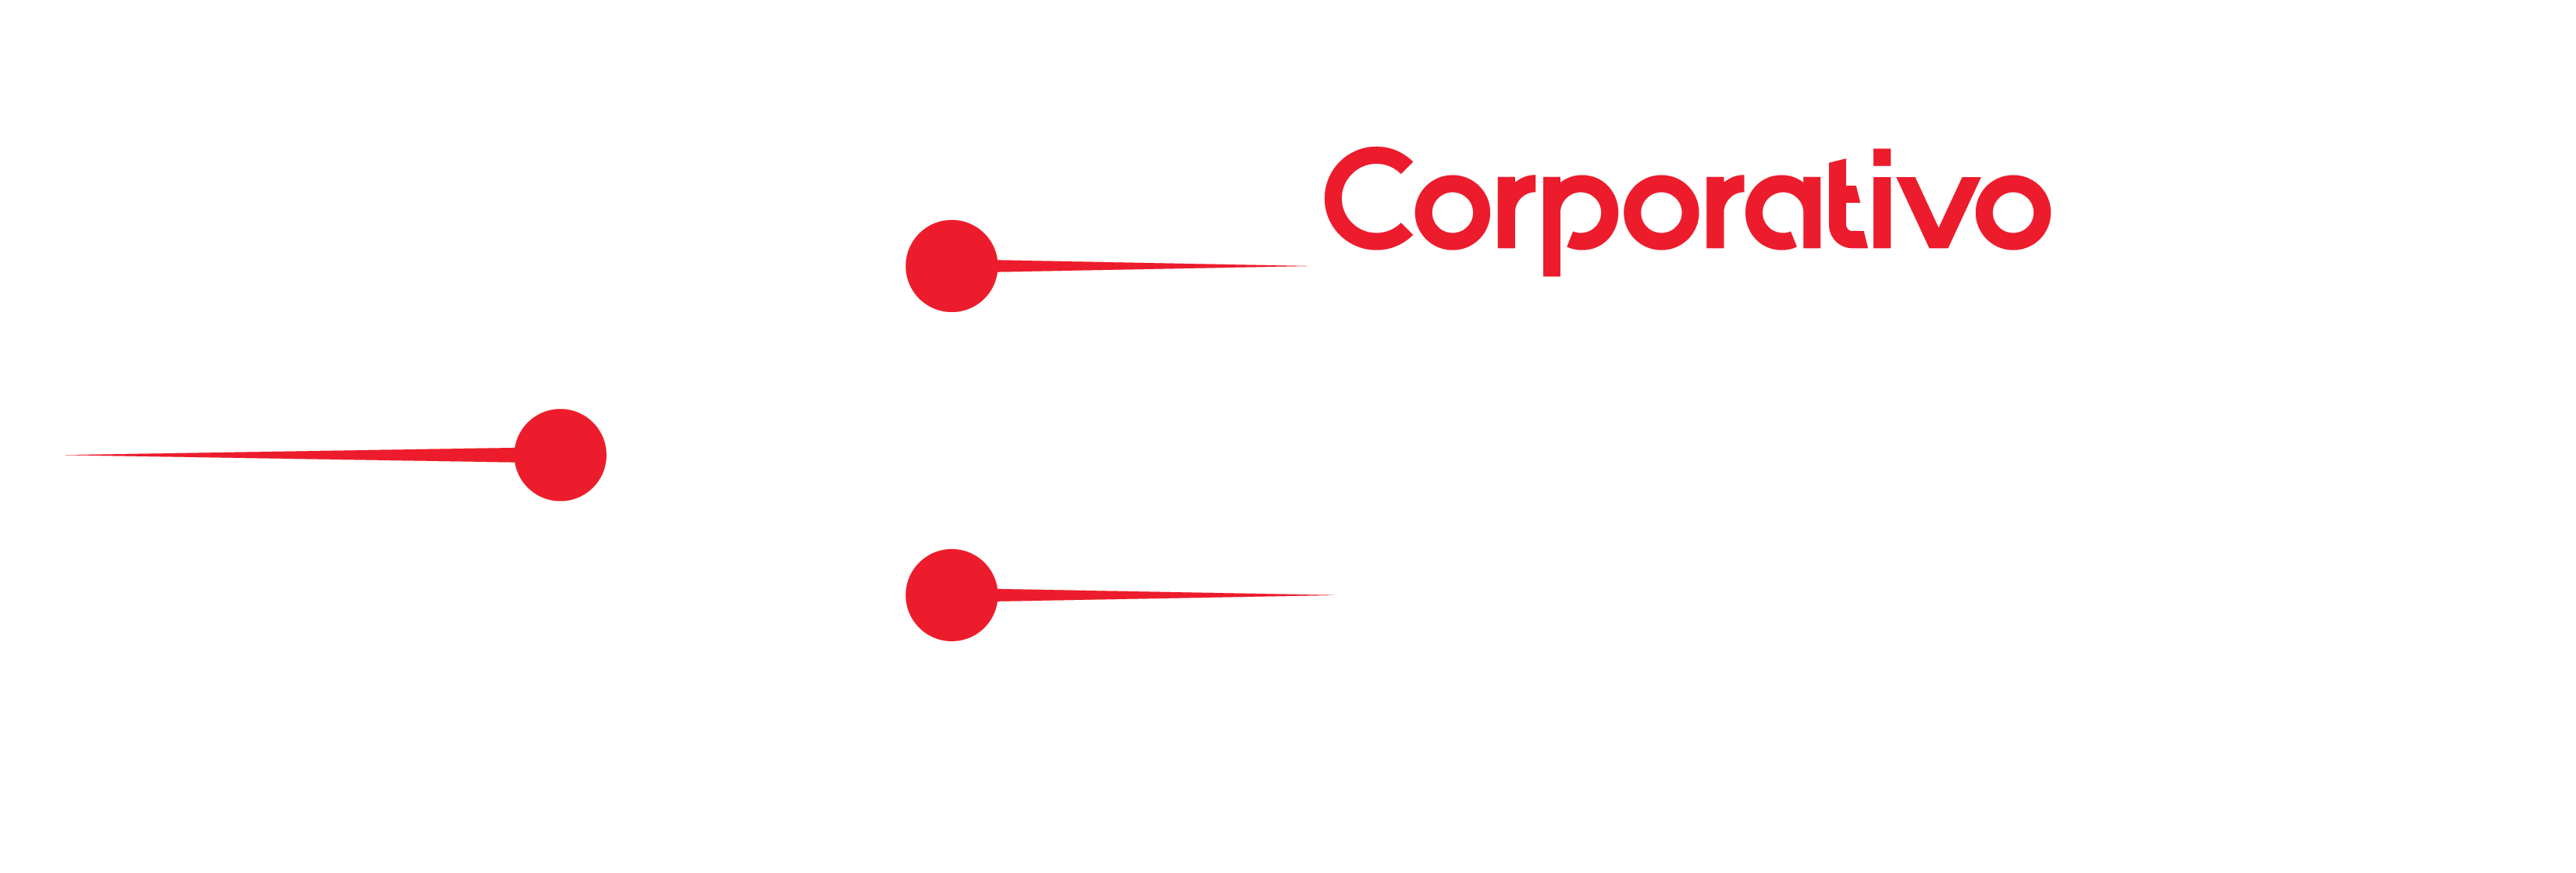 Corporativo VAR |